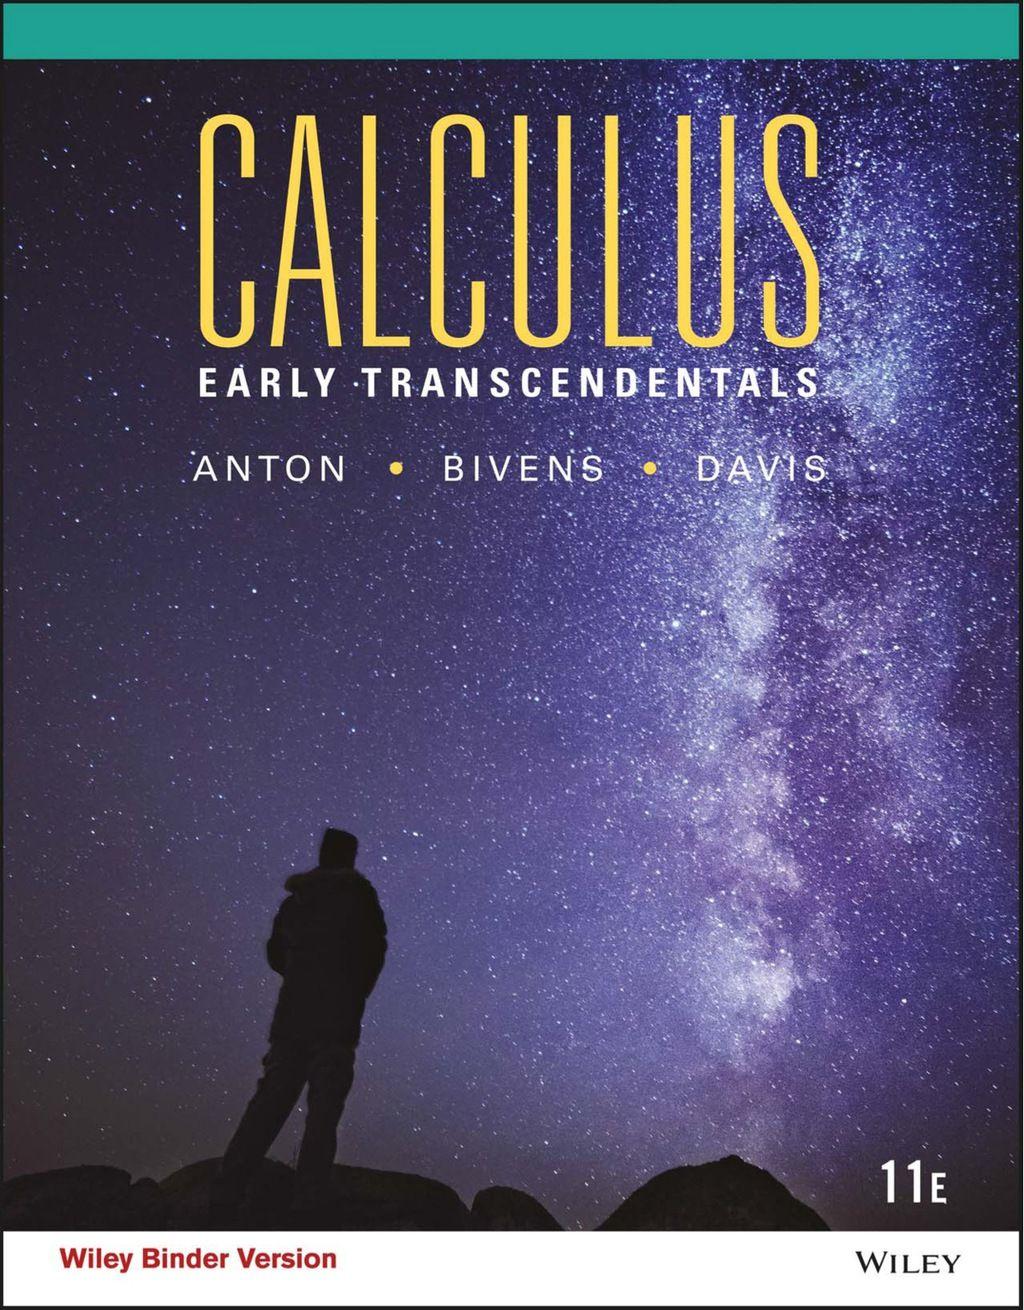 Calculus Early Transcendentals Ebook Rental